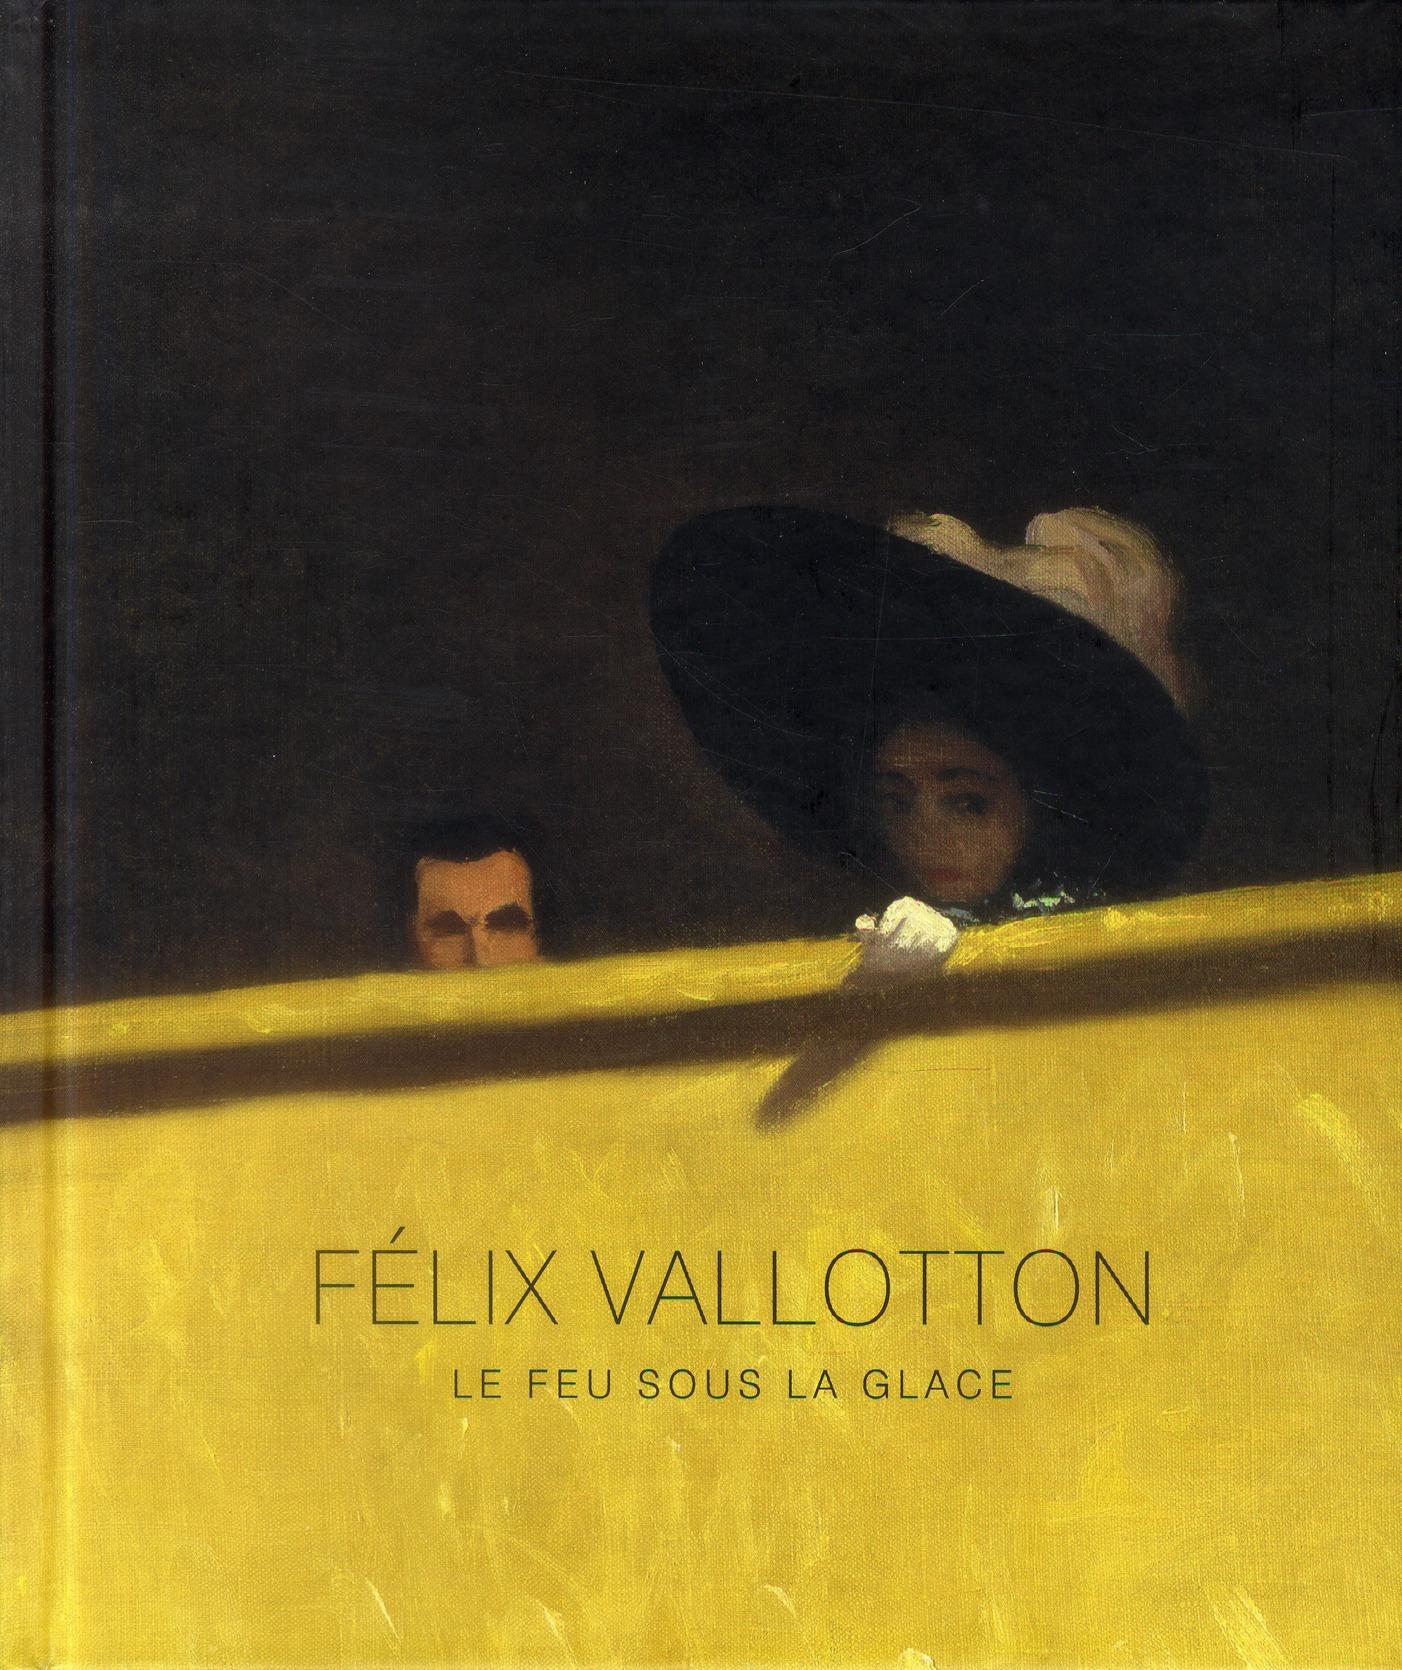 FELIX VALLOTTON - CATALOGUE. - LE FEU SOUS LA GLACE